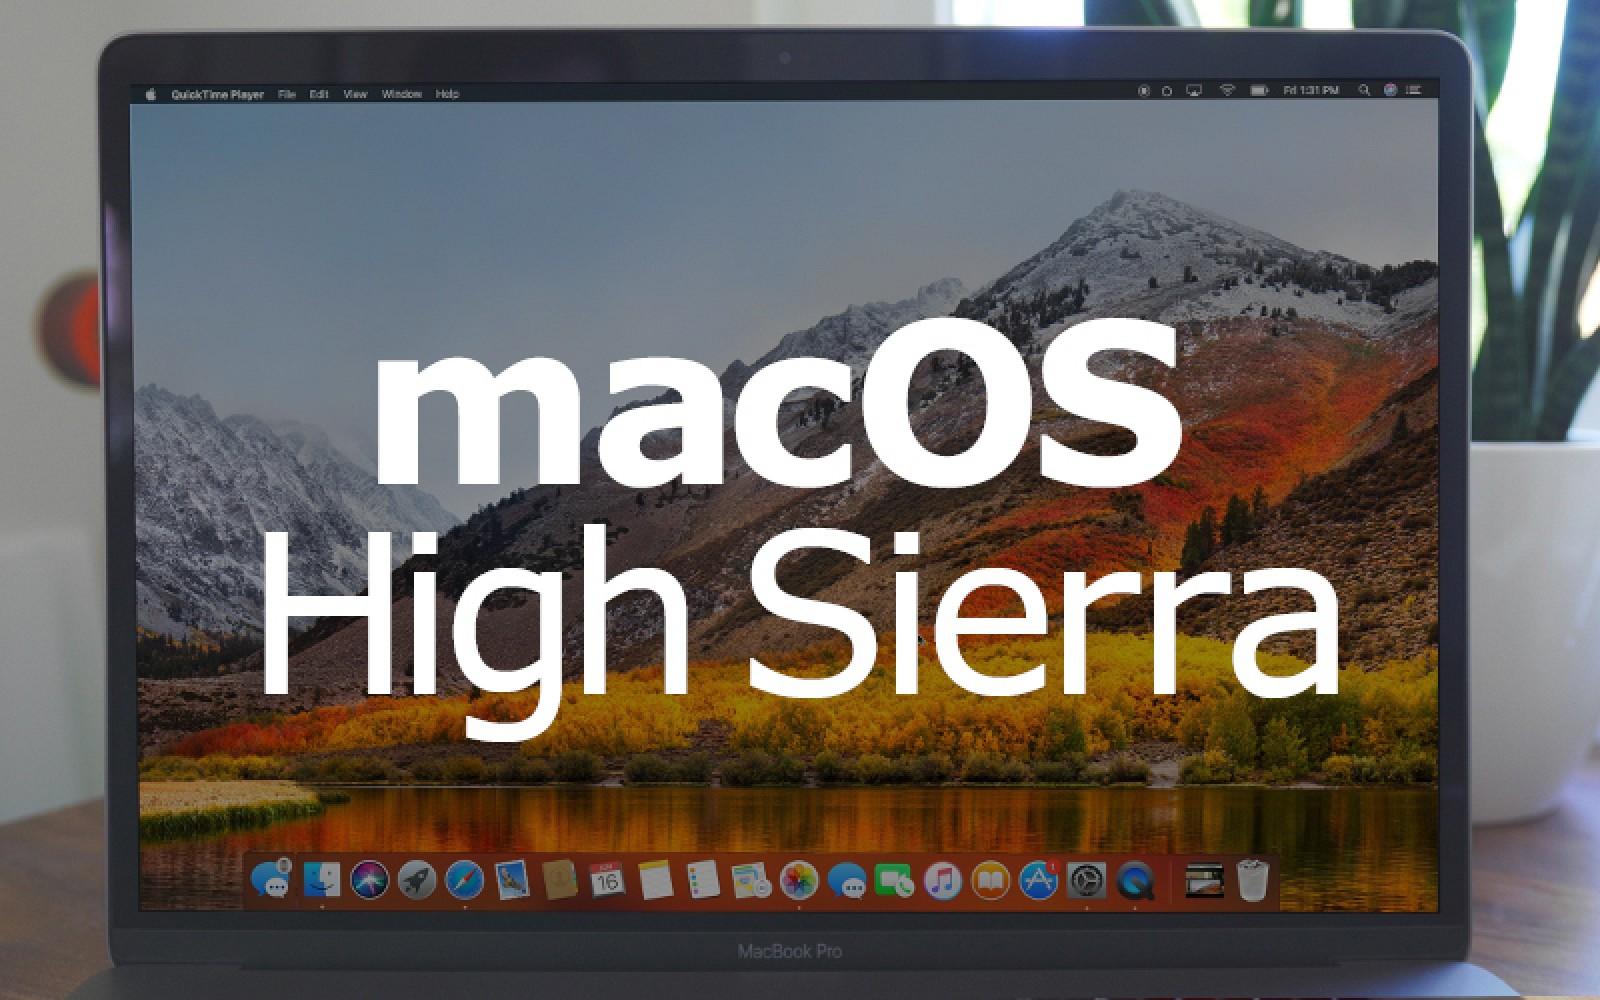 macOS High Sierra Will Be Released on September 25 - MacRumors